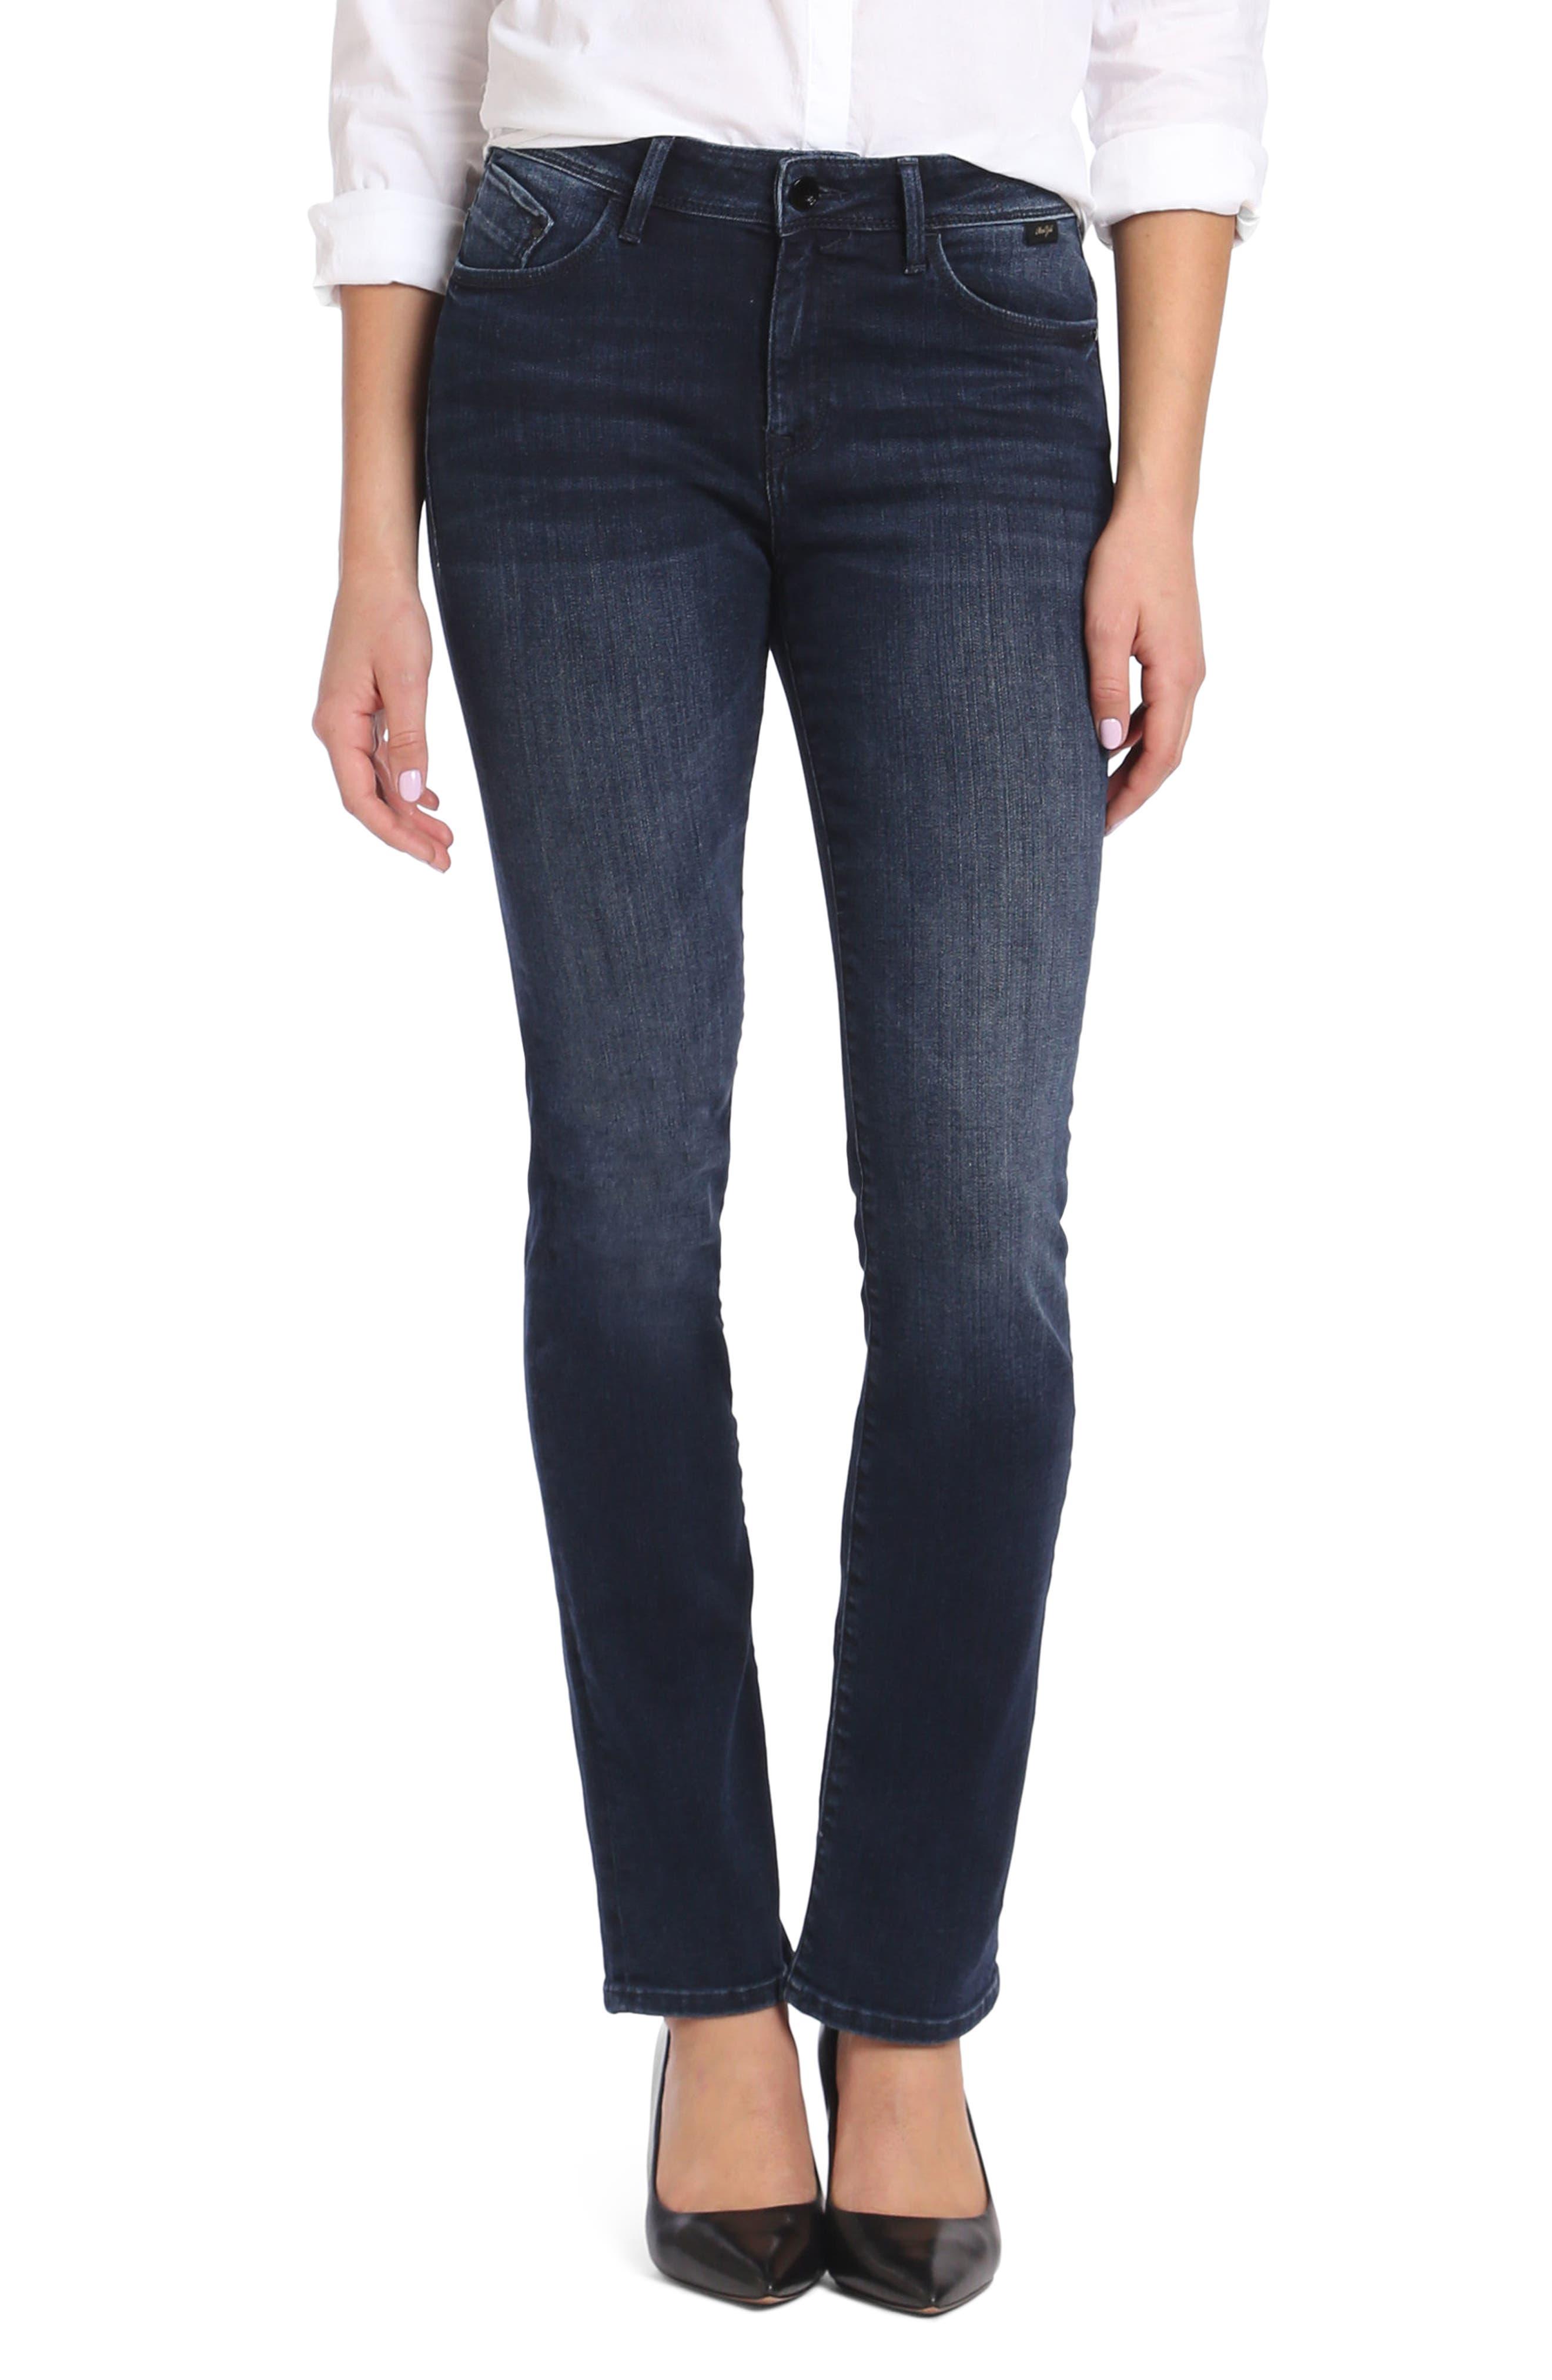 Main Image - Mavi Jeans Kendra High Waist Straight Jeans (Deep Ink Gold)